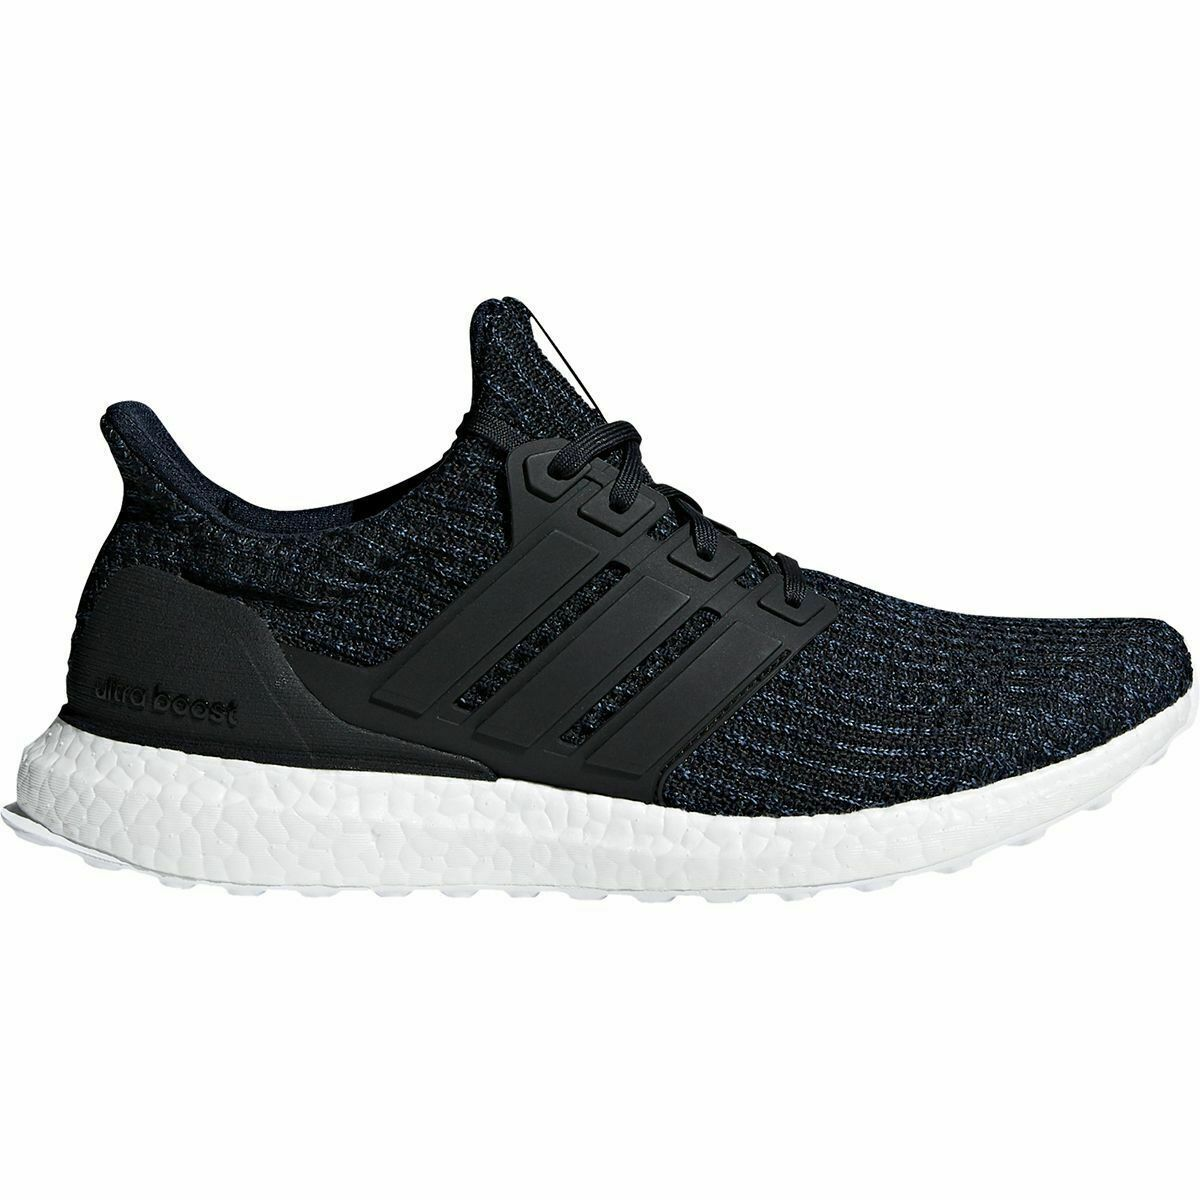 Adidas UltraBOOST Parley Running shoes Deep Ocean bluee Black AC7836 Men's NEW